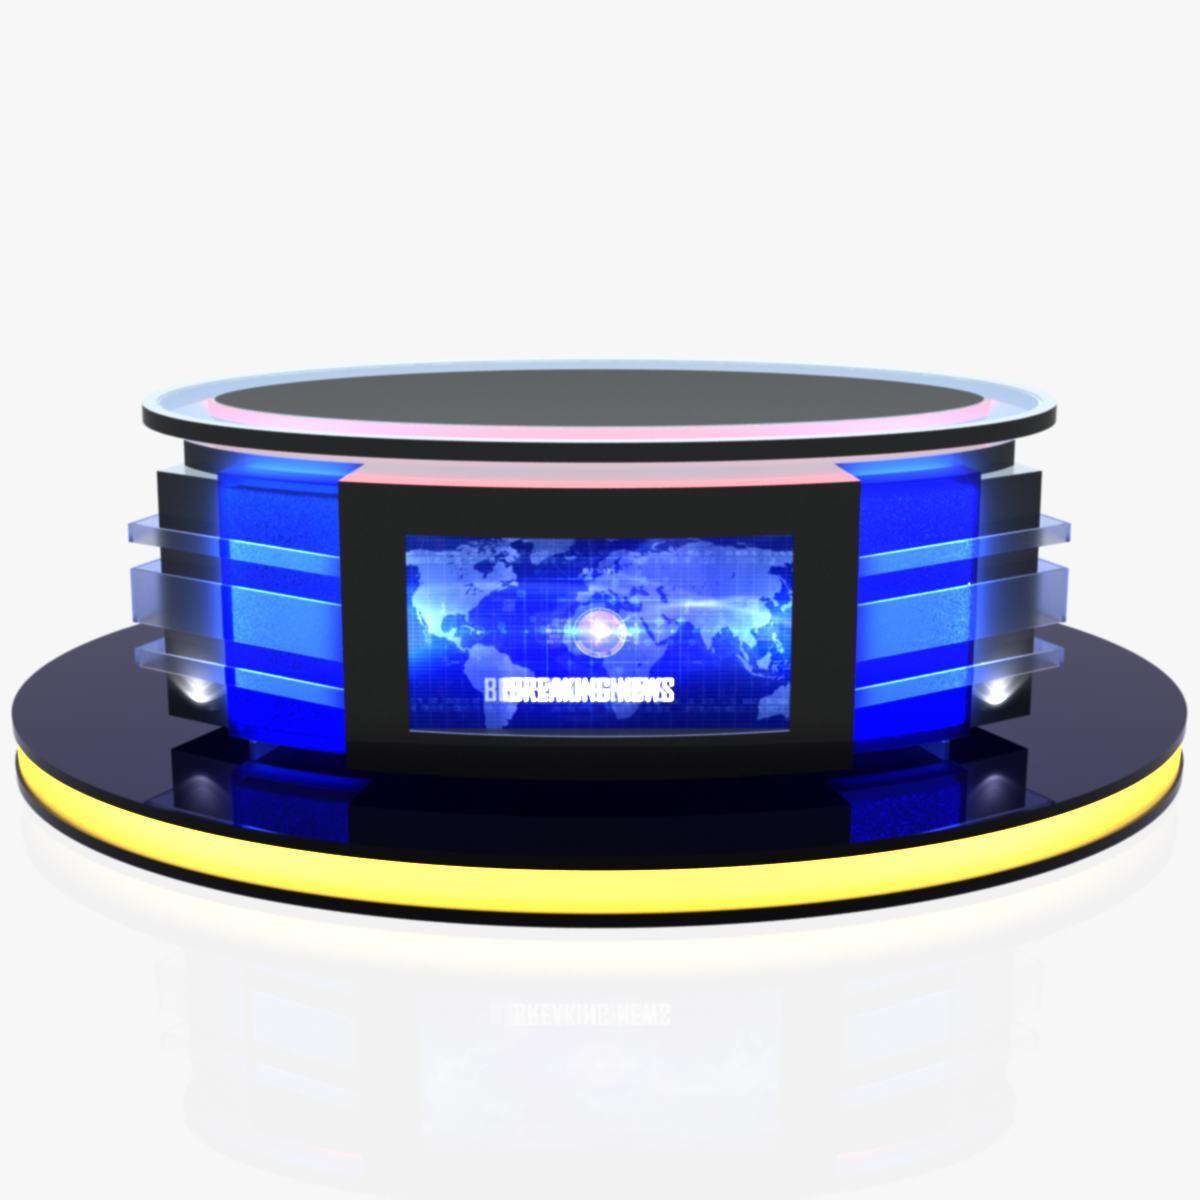 Virtual Tv Studio News Desk 12 By Canan85 3docean